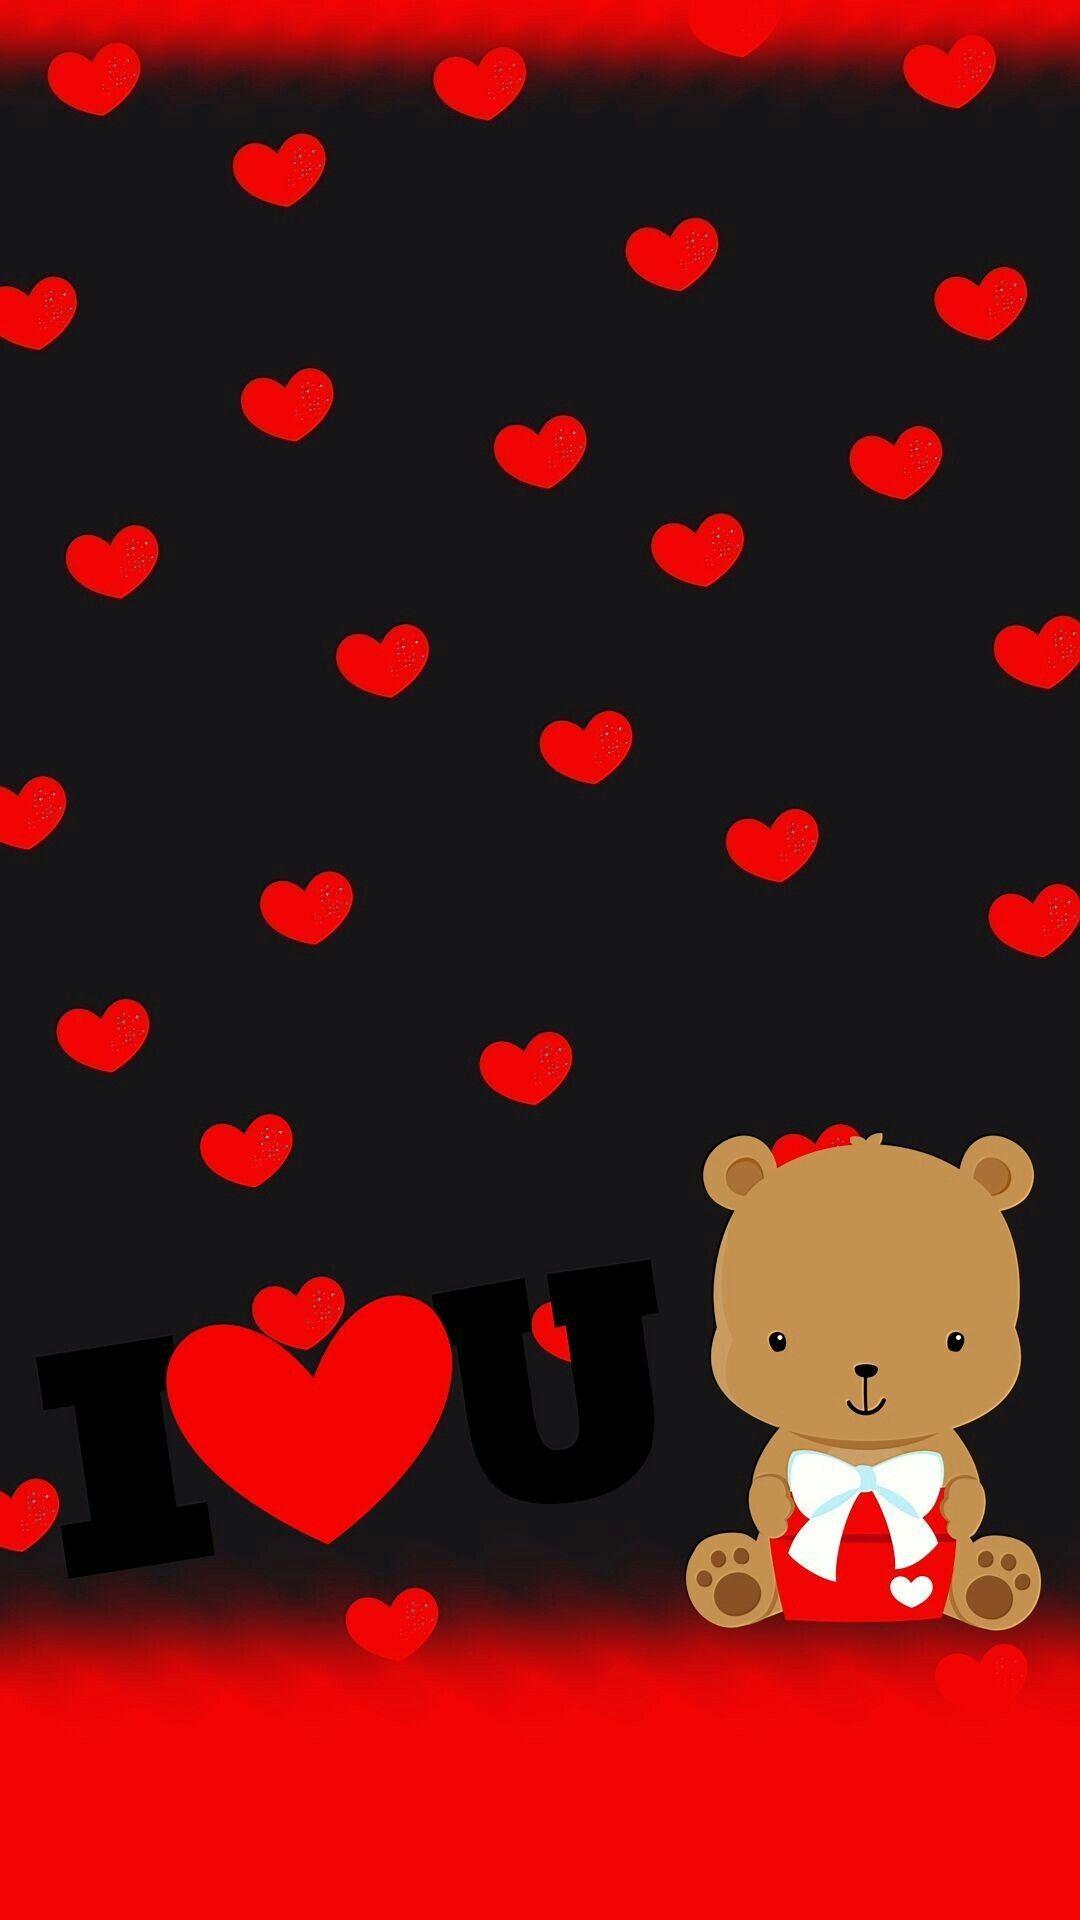 Cute Love Galaxy s8 wallpaper